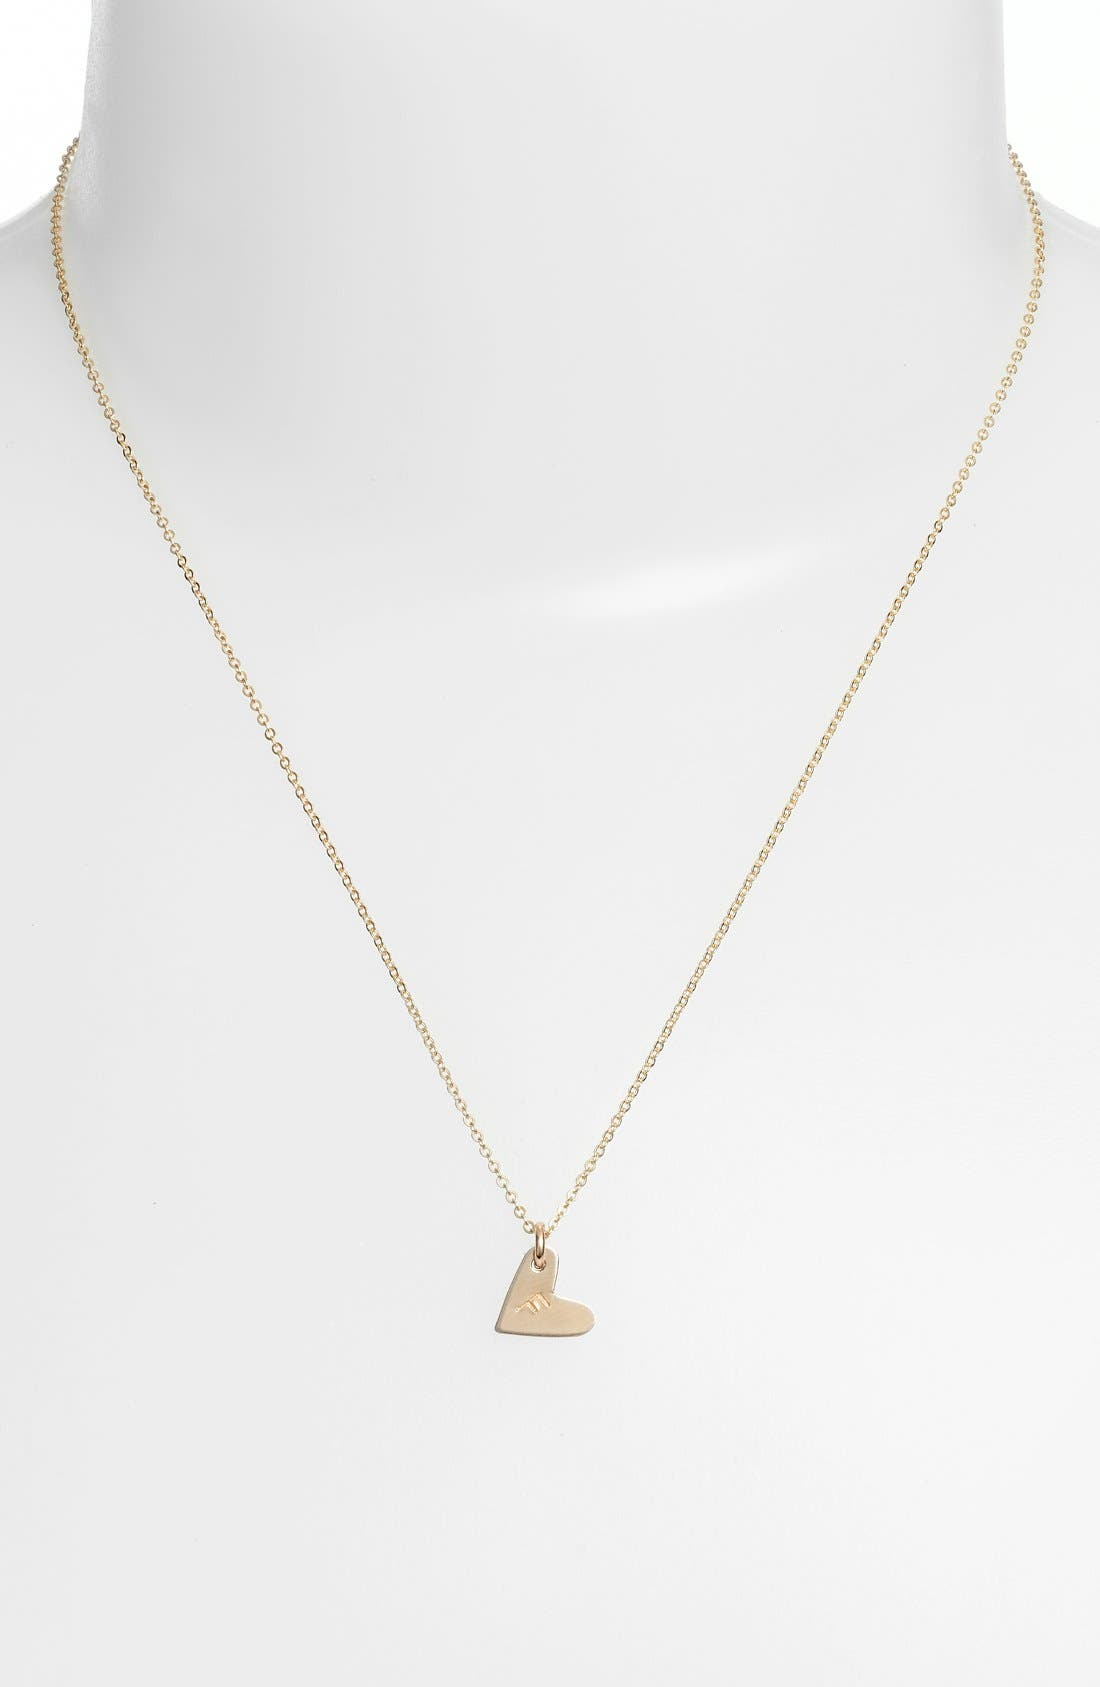 14k-Gold Fill Initial Mini Heart Pendant Necklace,                             Alternate thumbnail 2, color,                             Gold/ F